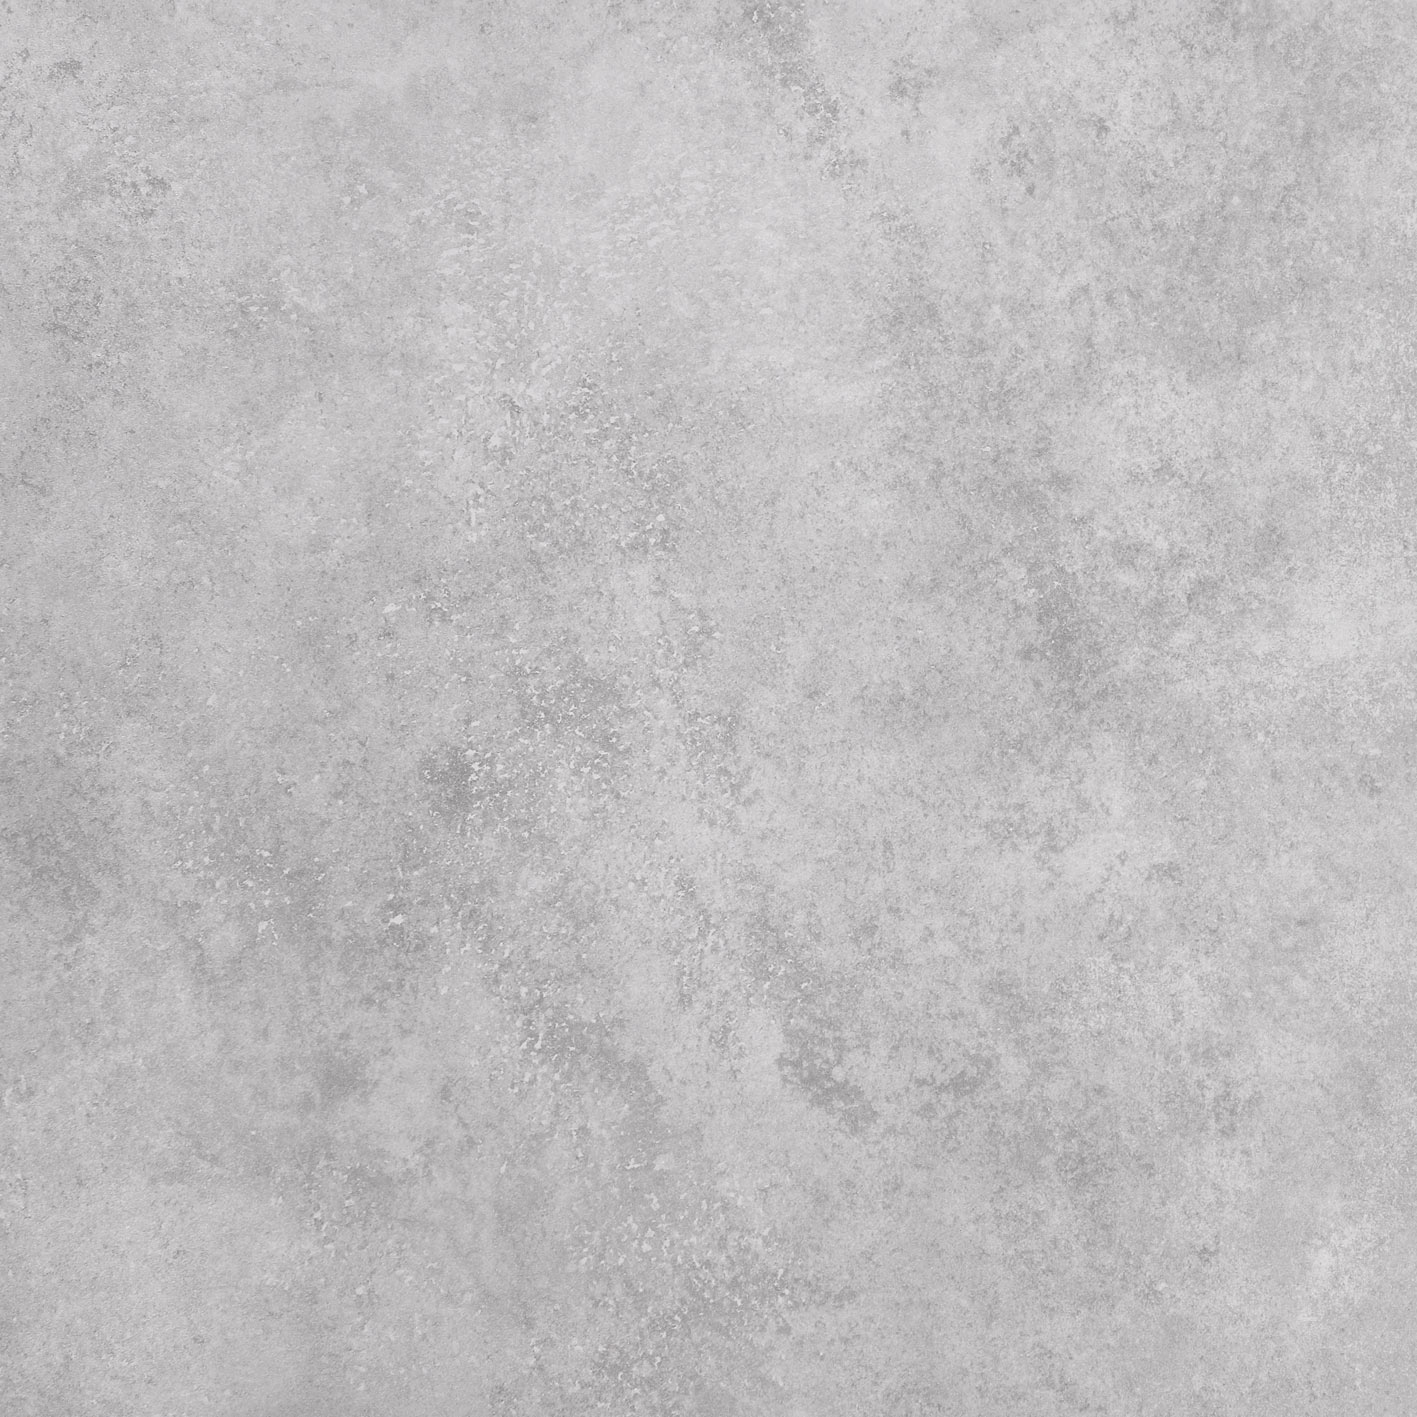 Gent grau GET331A R10 rect. 60x60x0,8 - Hansas Plaadimaailm